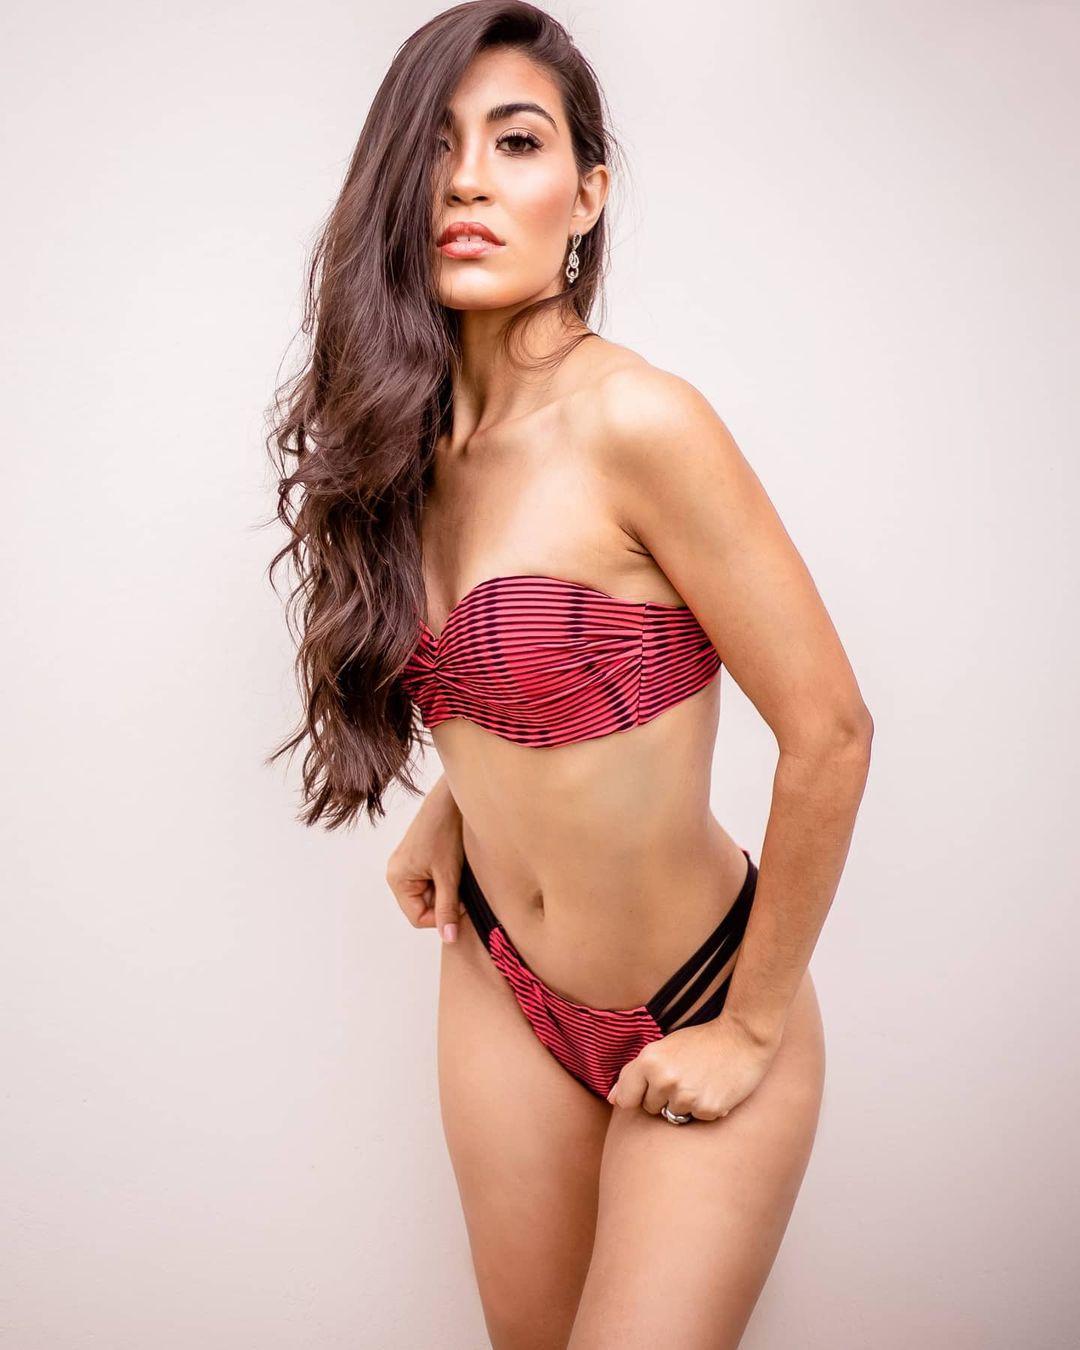 sarah chinikoski, miss brasil intercontinental 2021. Bdbghx10